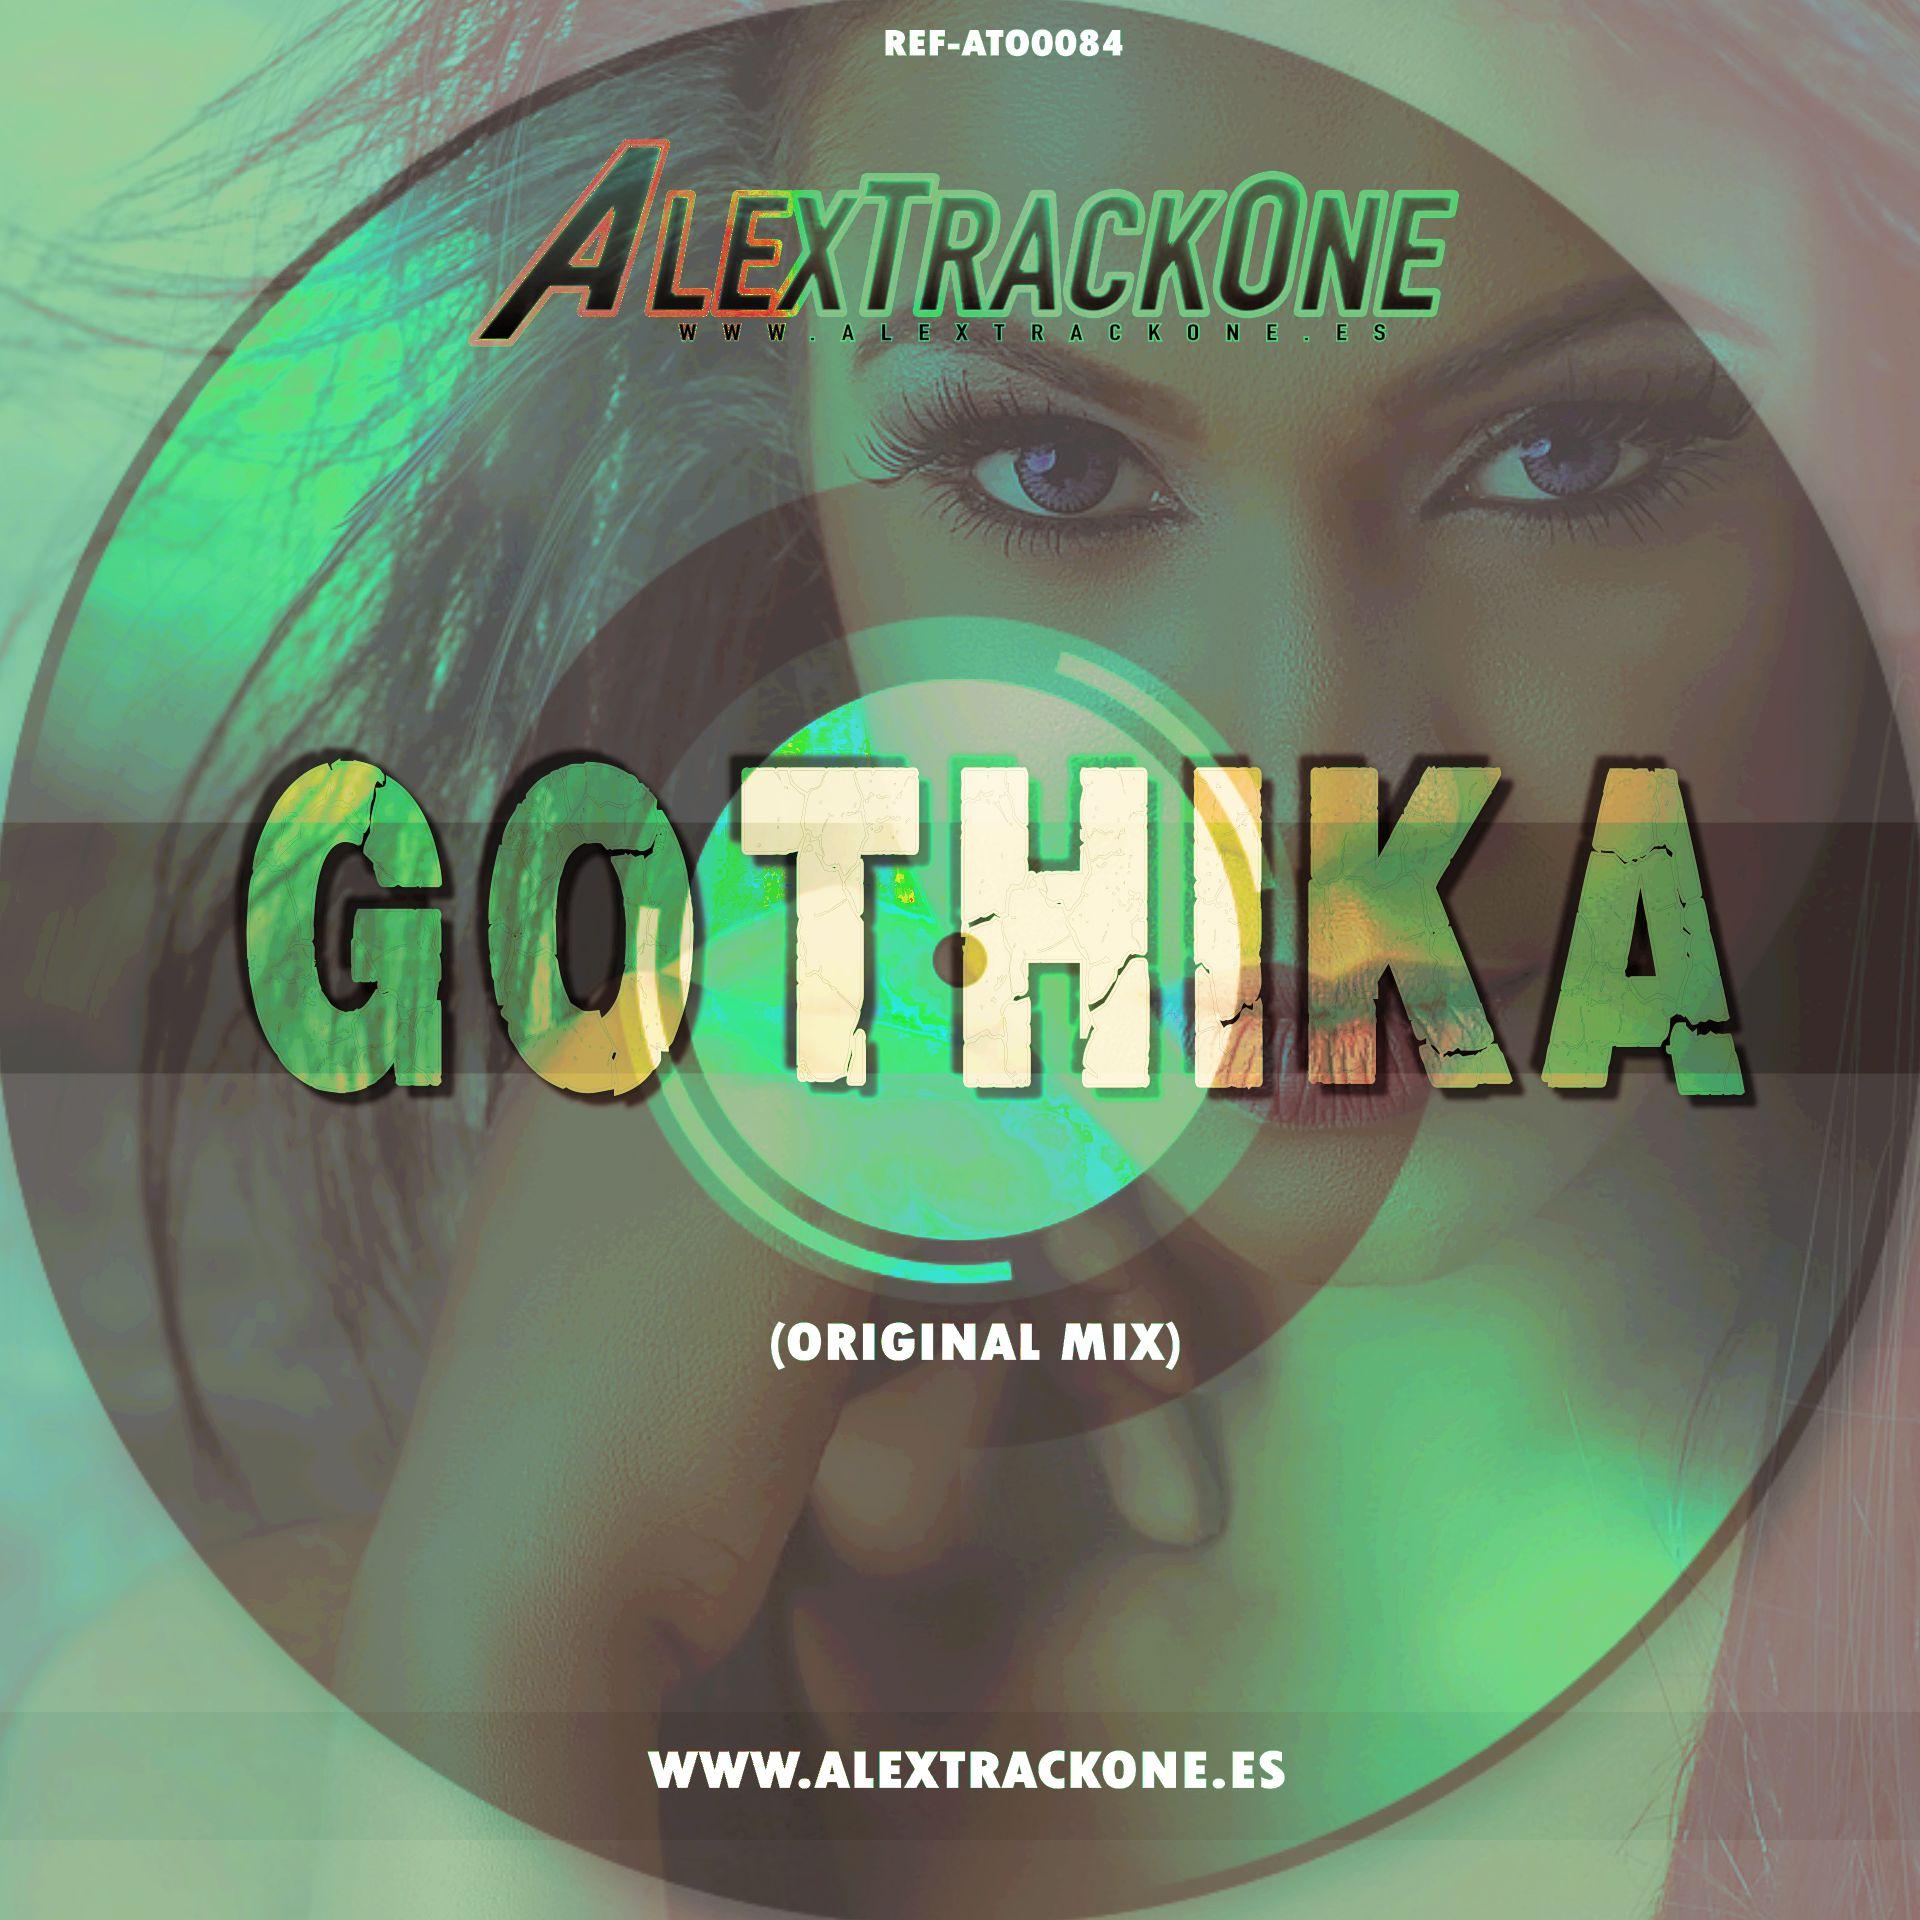 REF-ATO0084 GOTHIKA (ORIGINAL MIX) (MP3 & WAV & FLAC)